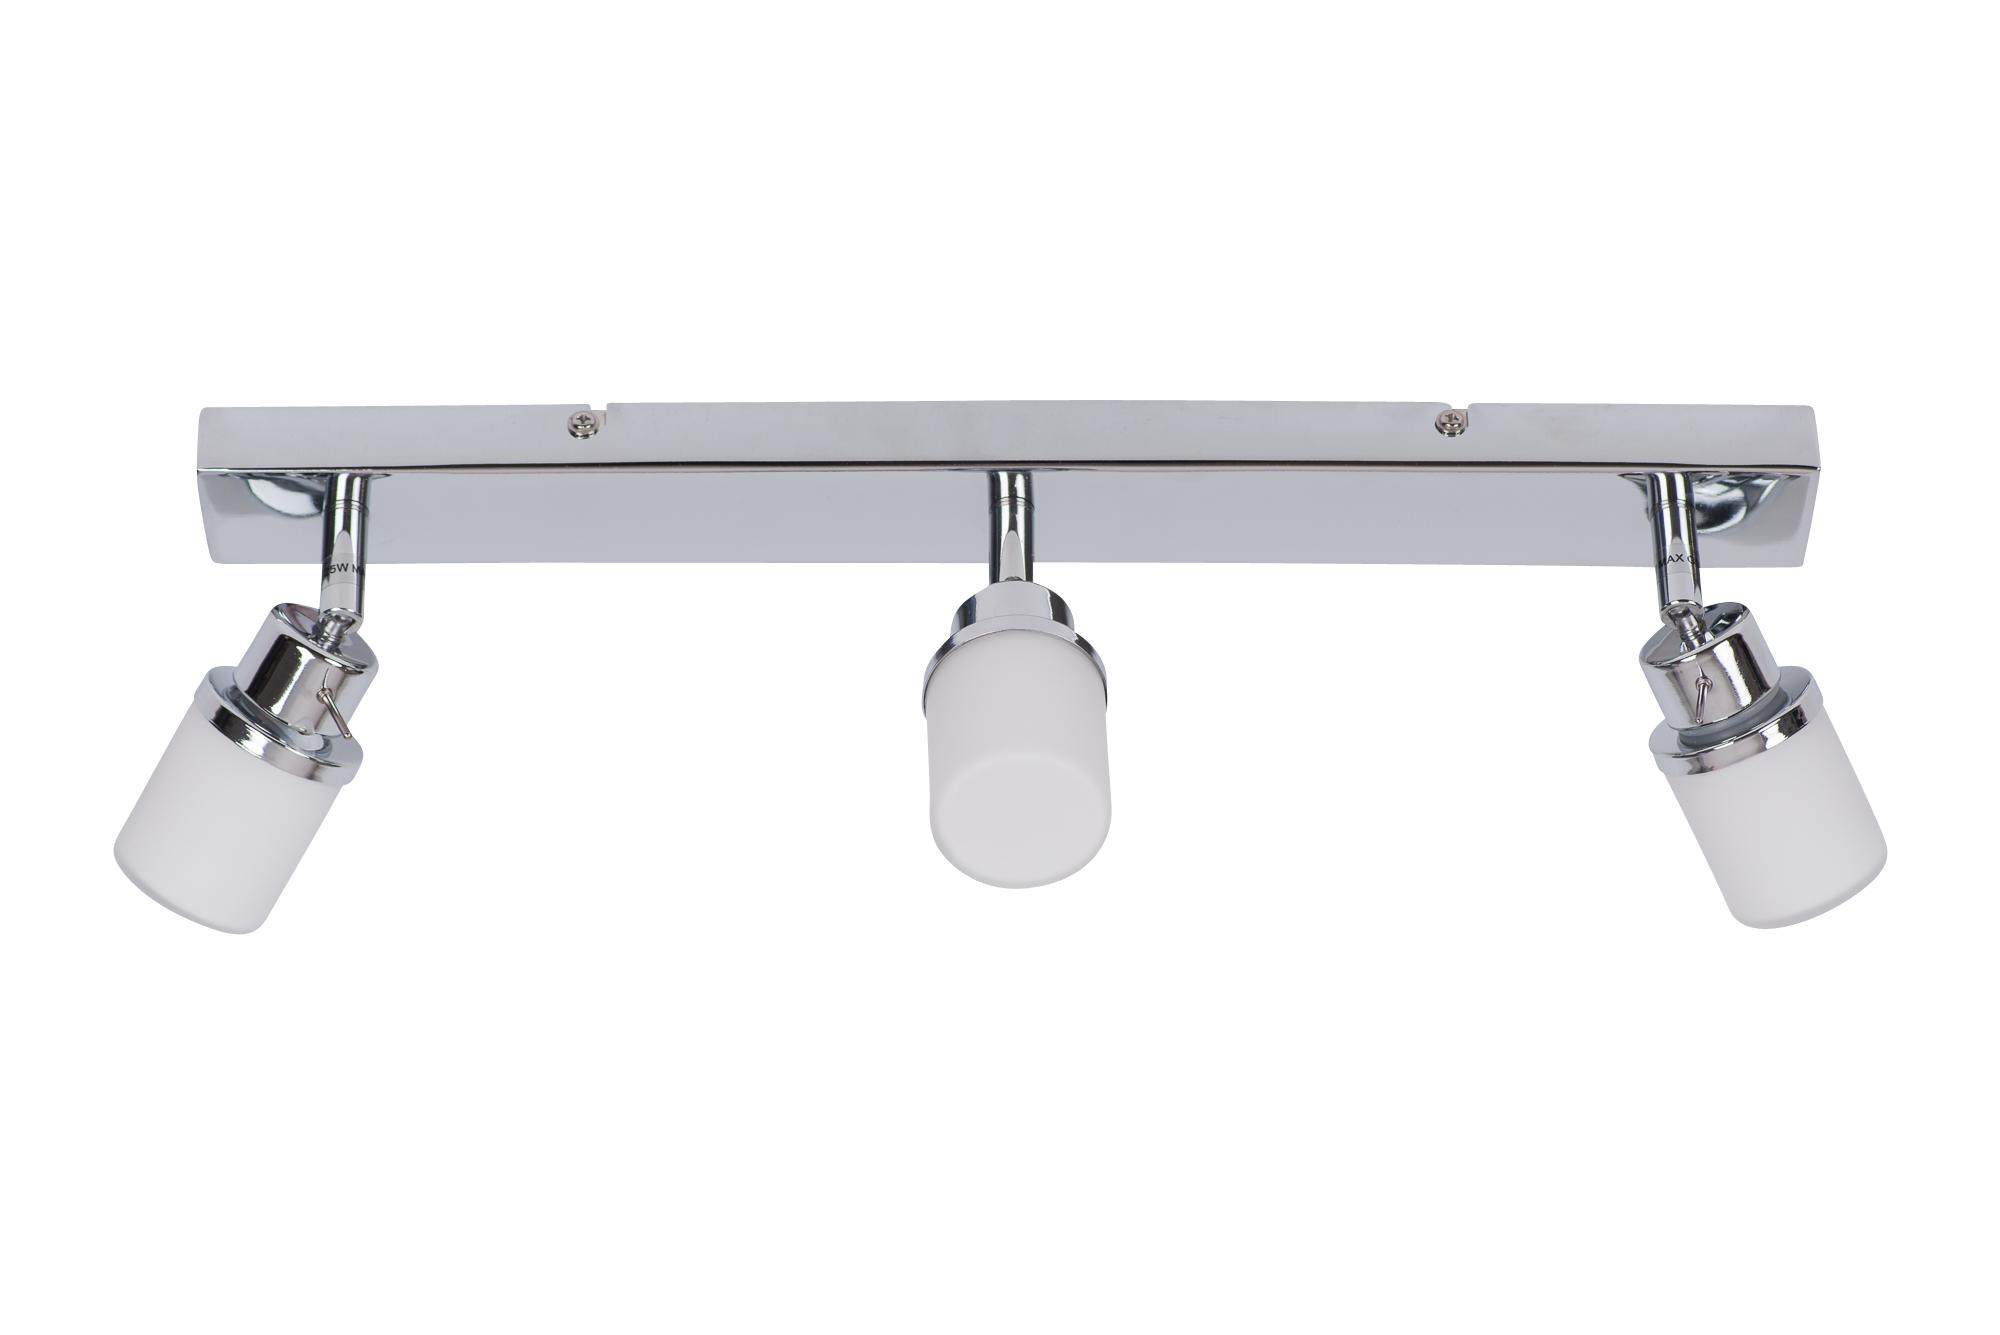 Modern Led Bathroom Ceiling Light Chrome Finish Ip44 Rated: Modern Chrome & Glass 3 Way IP44 Bathroom Ceiling Spot